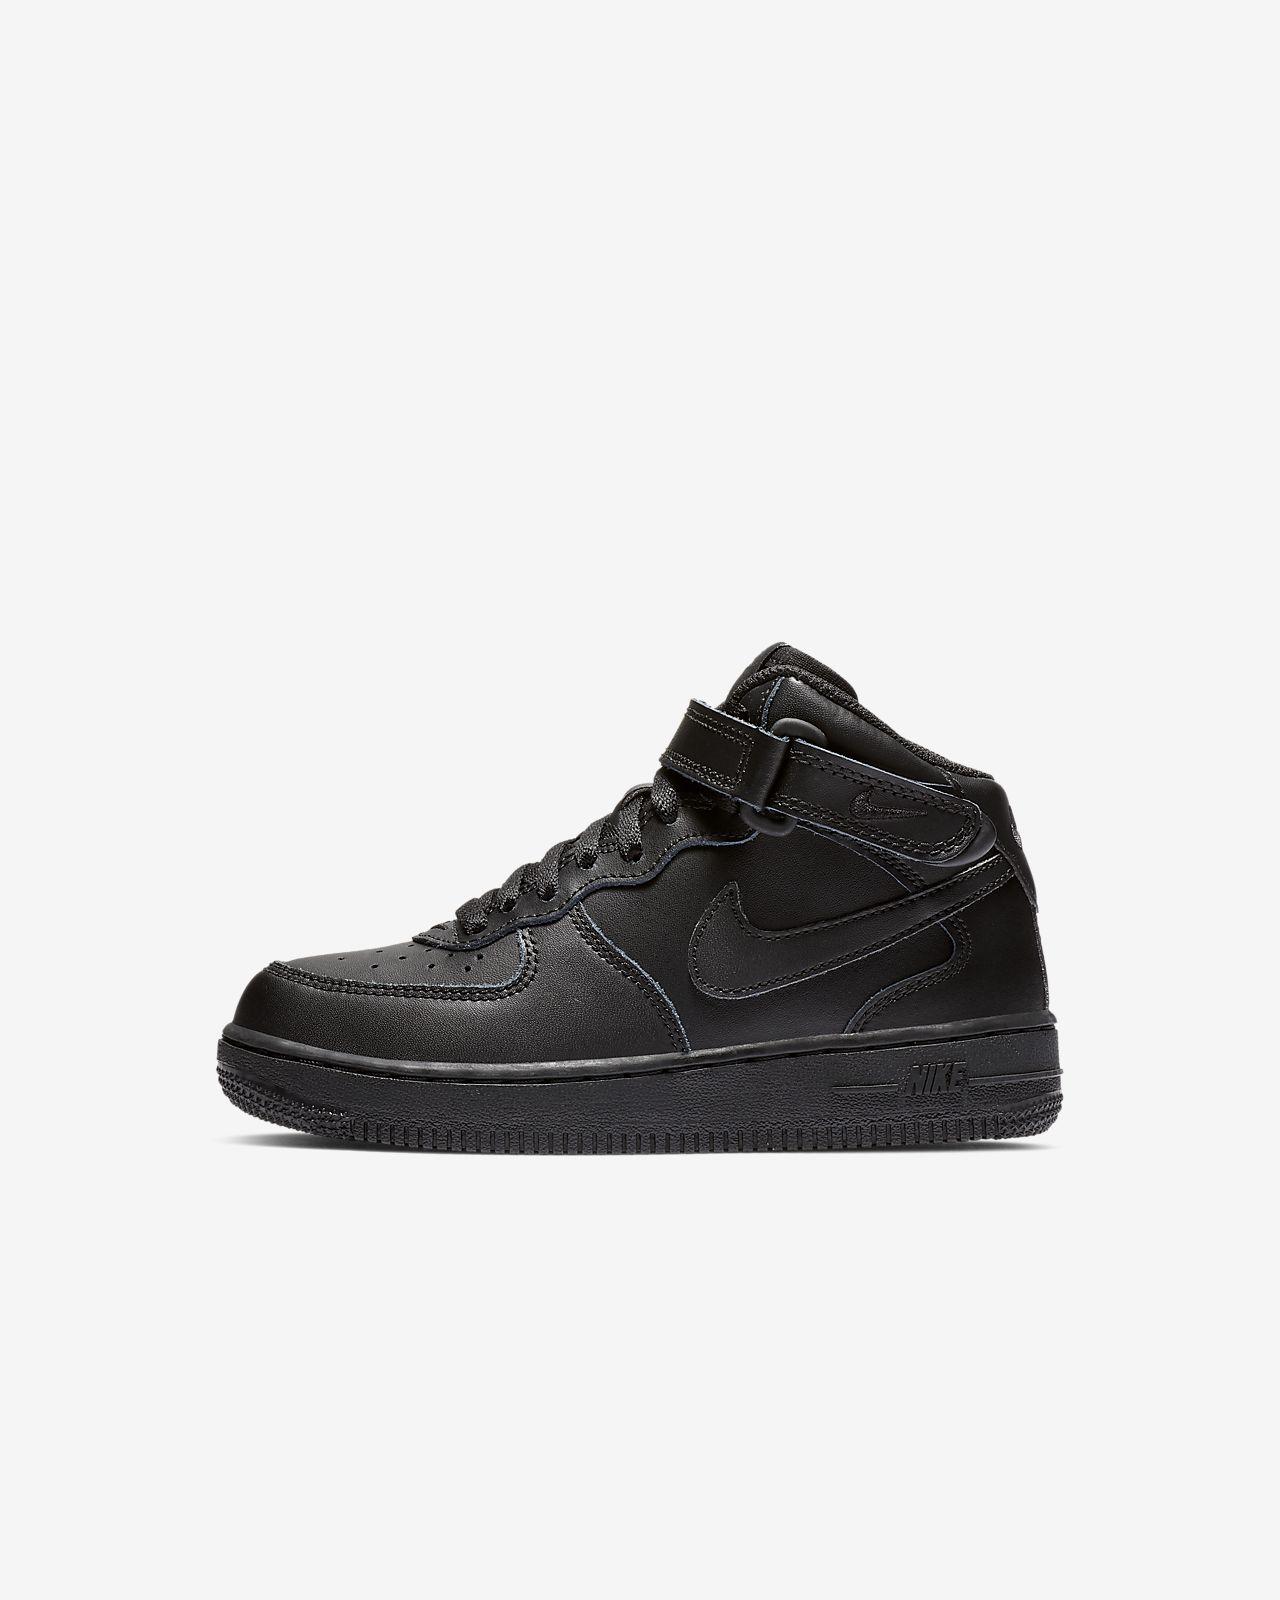 Nike Nike Air Force 1 Mid Youth GS Schuhe schwarz | Damen Hohe Sneaker · Eibe Kaufen